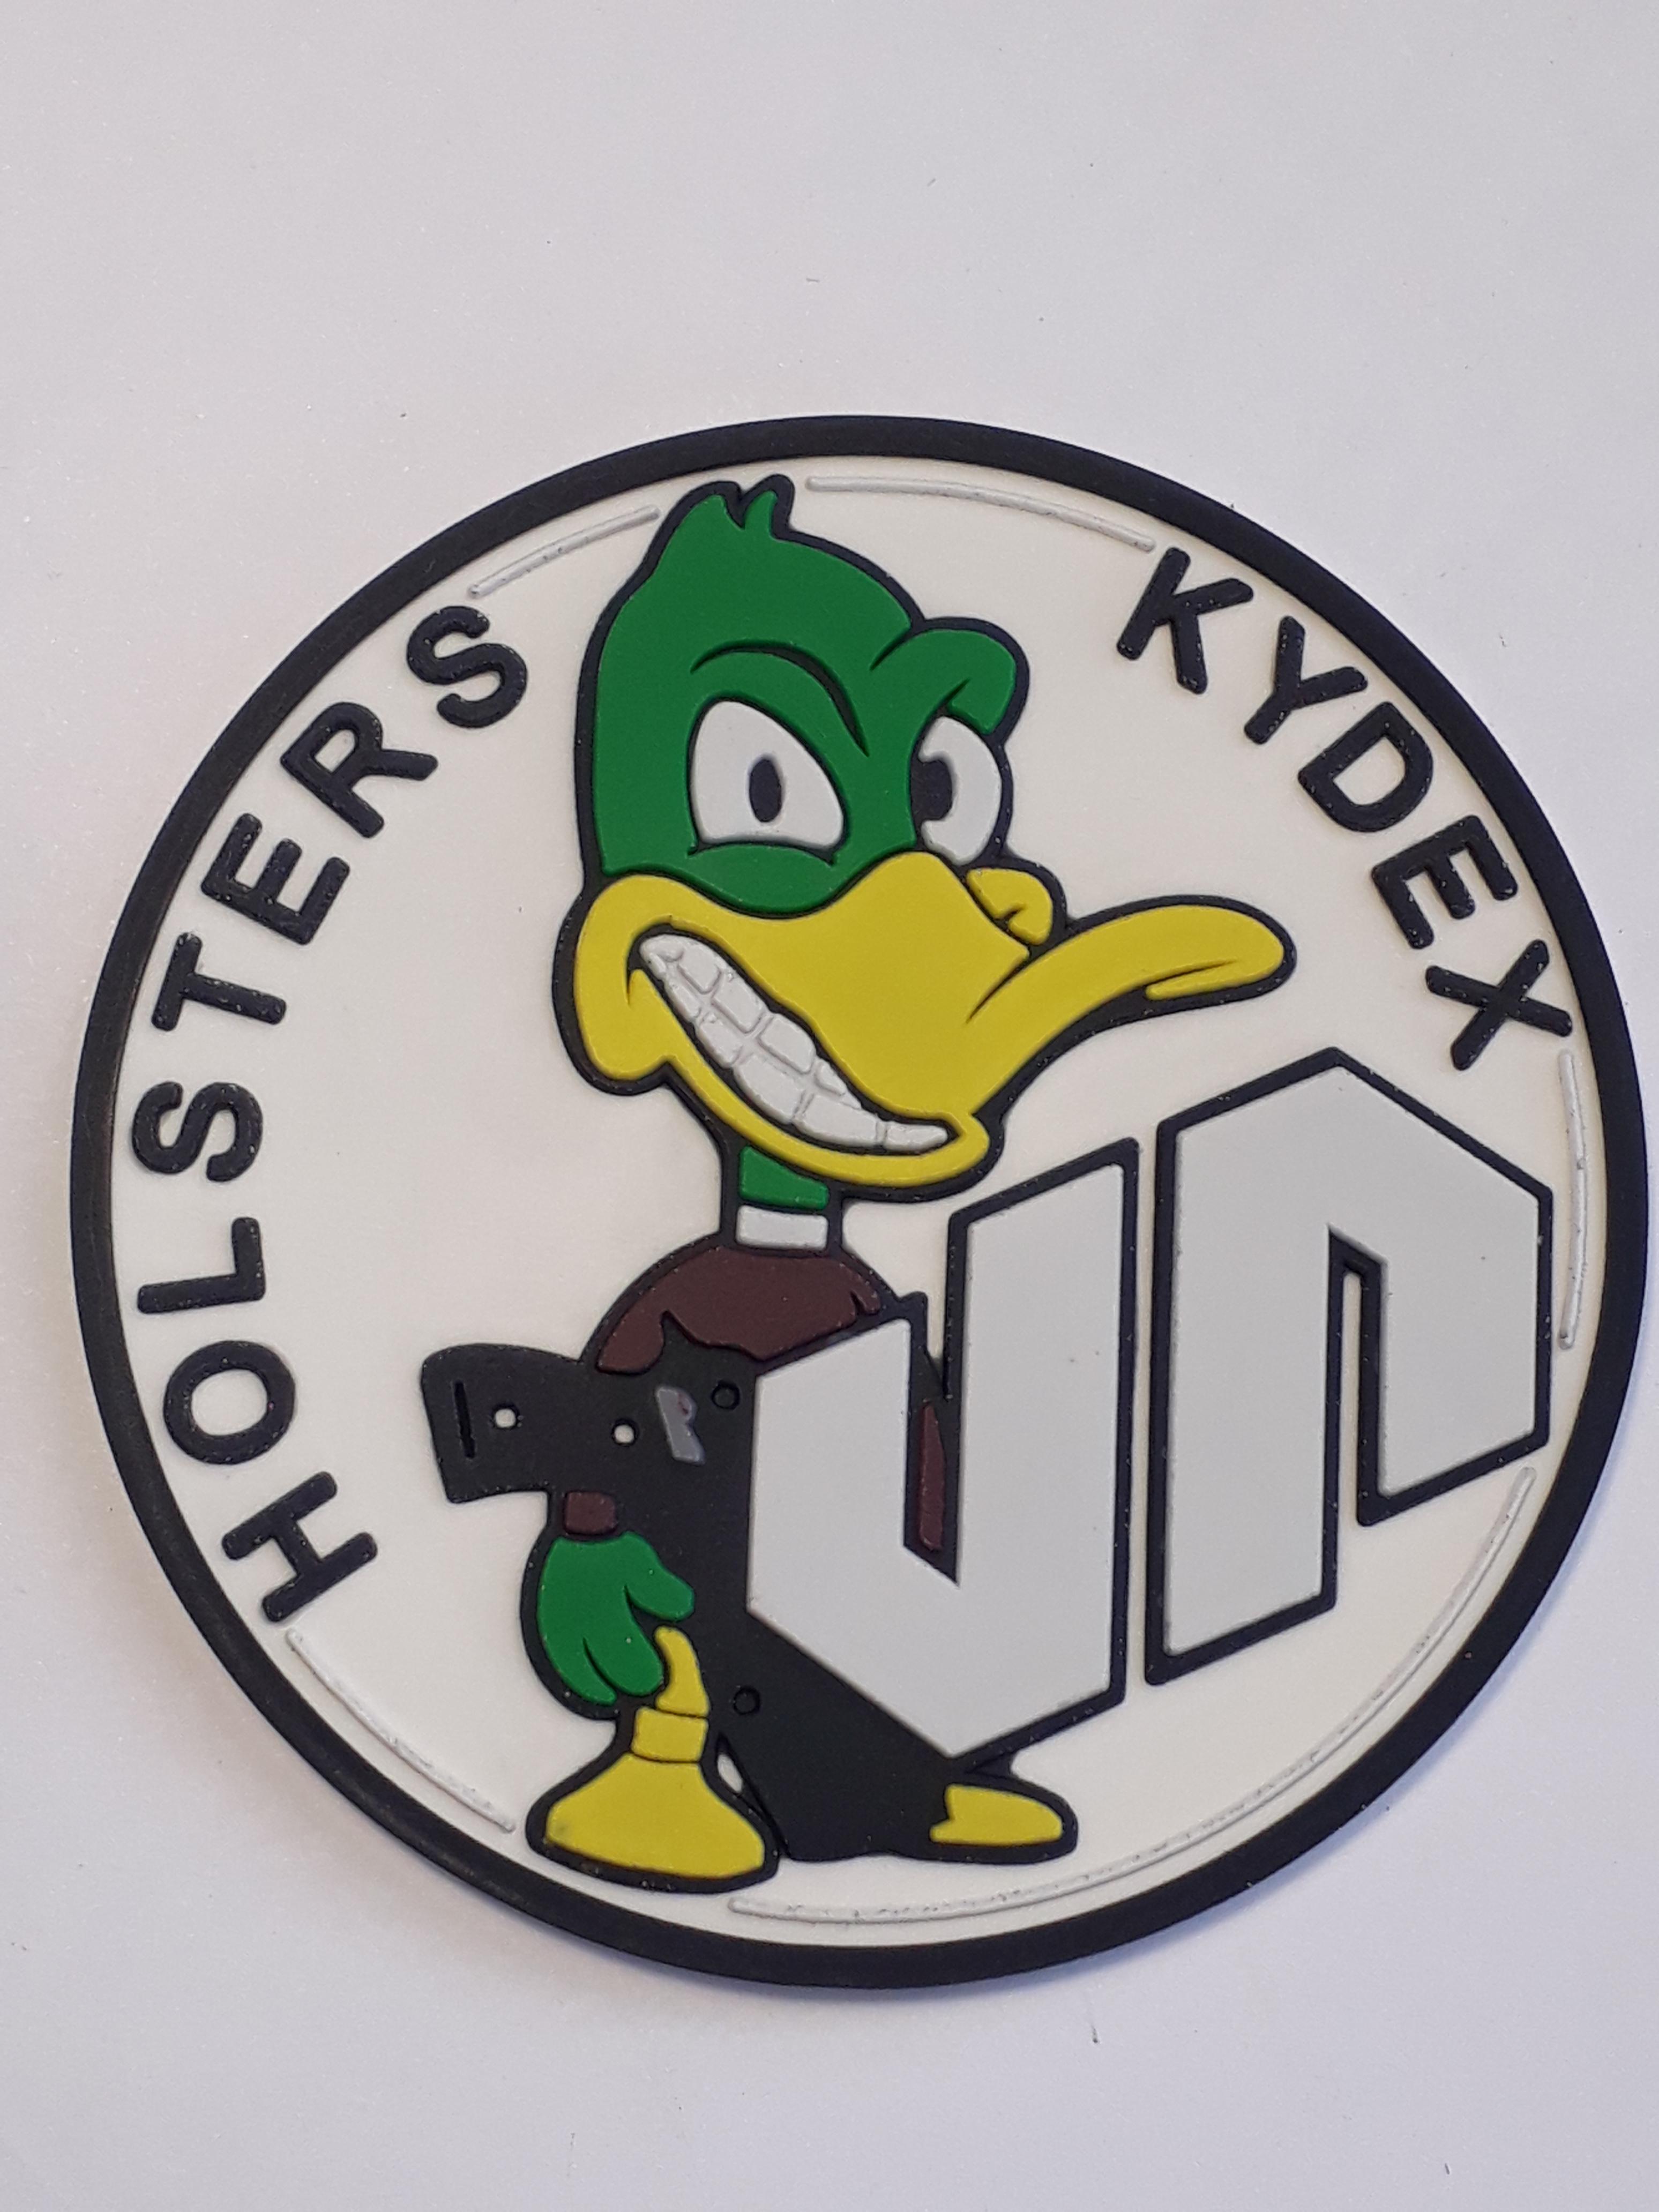 холстерс